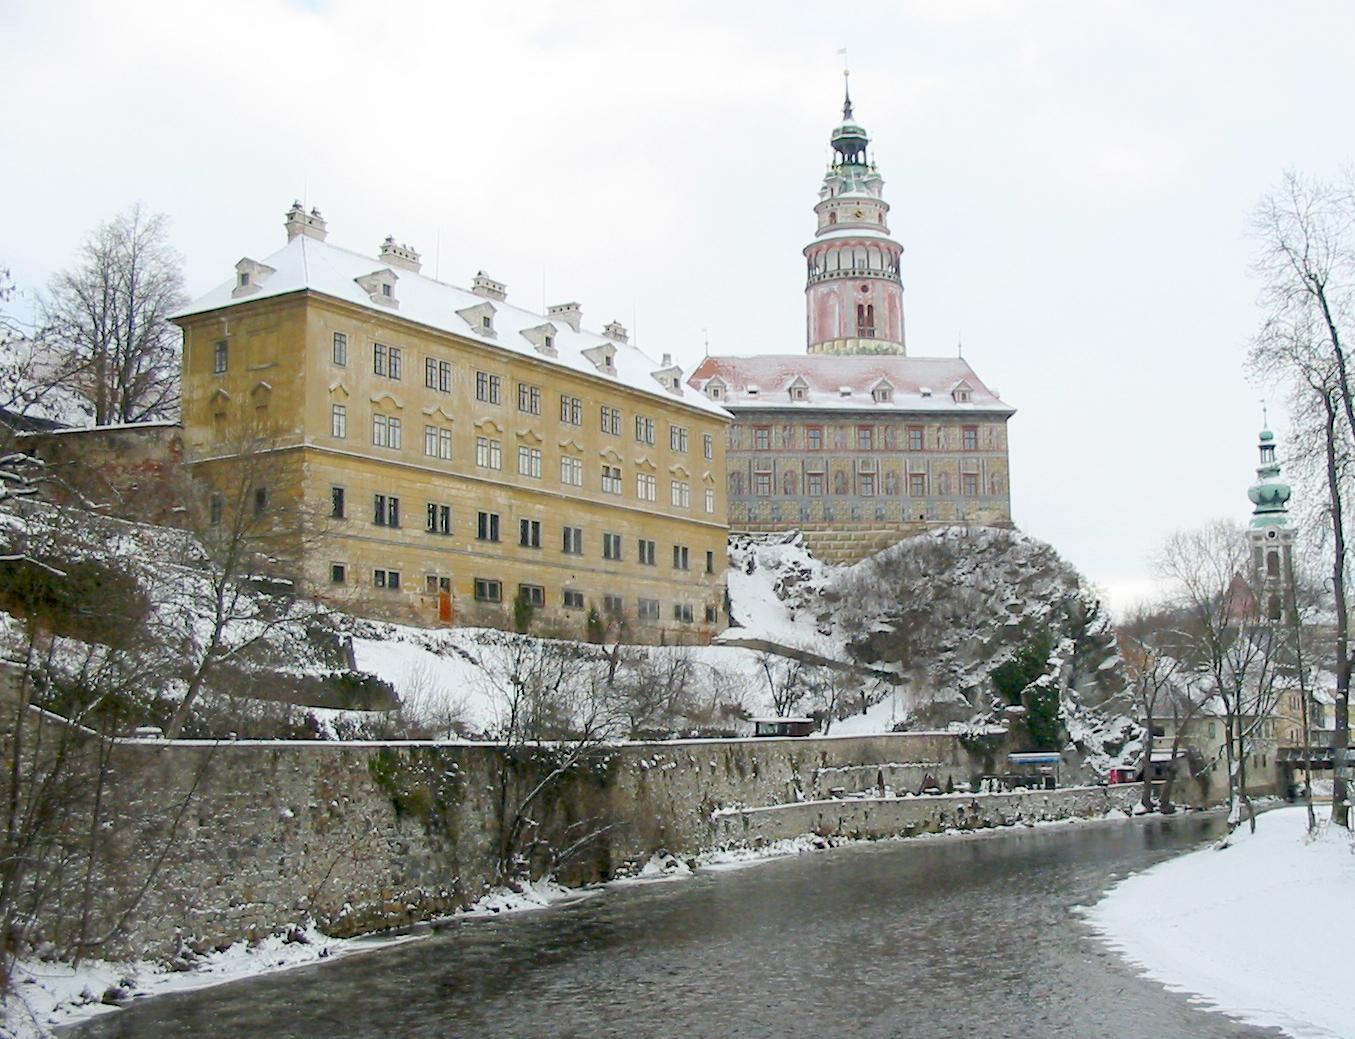 Description krumlov castle from the river bank